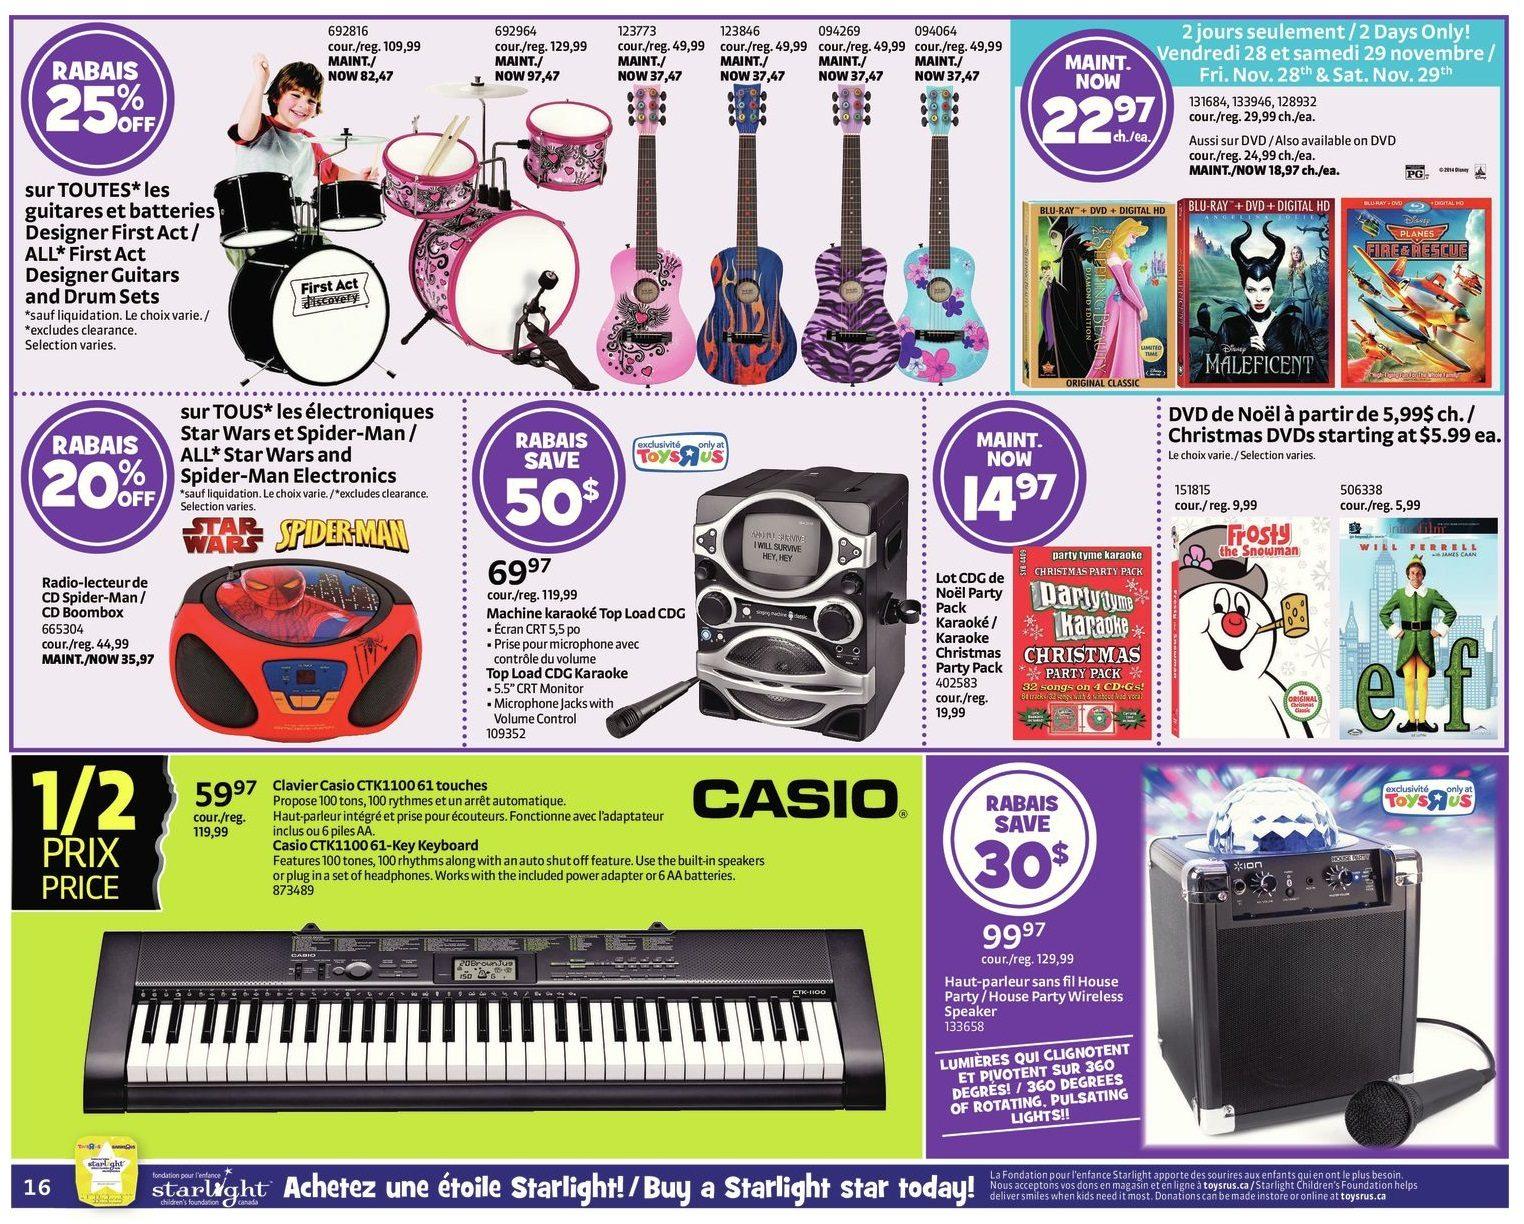 Toys R Us Weekly Flyer 1 2 Price Event Starts Black Friday Nov Ps4 Birthdays The Beginning Reg 28 Dec 3